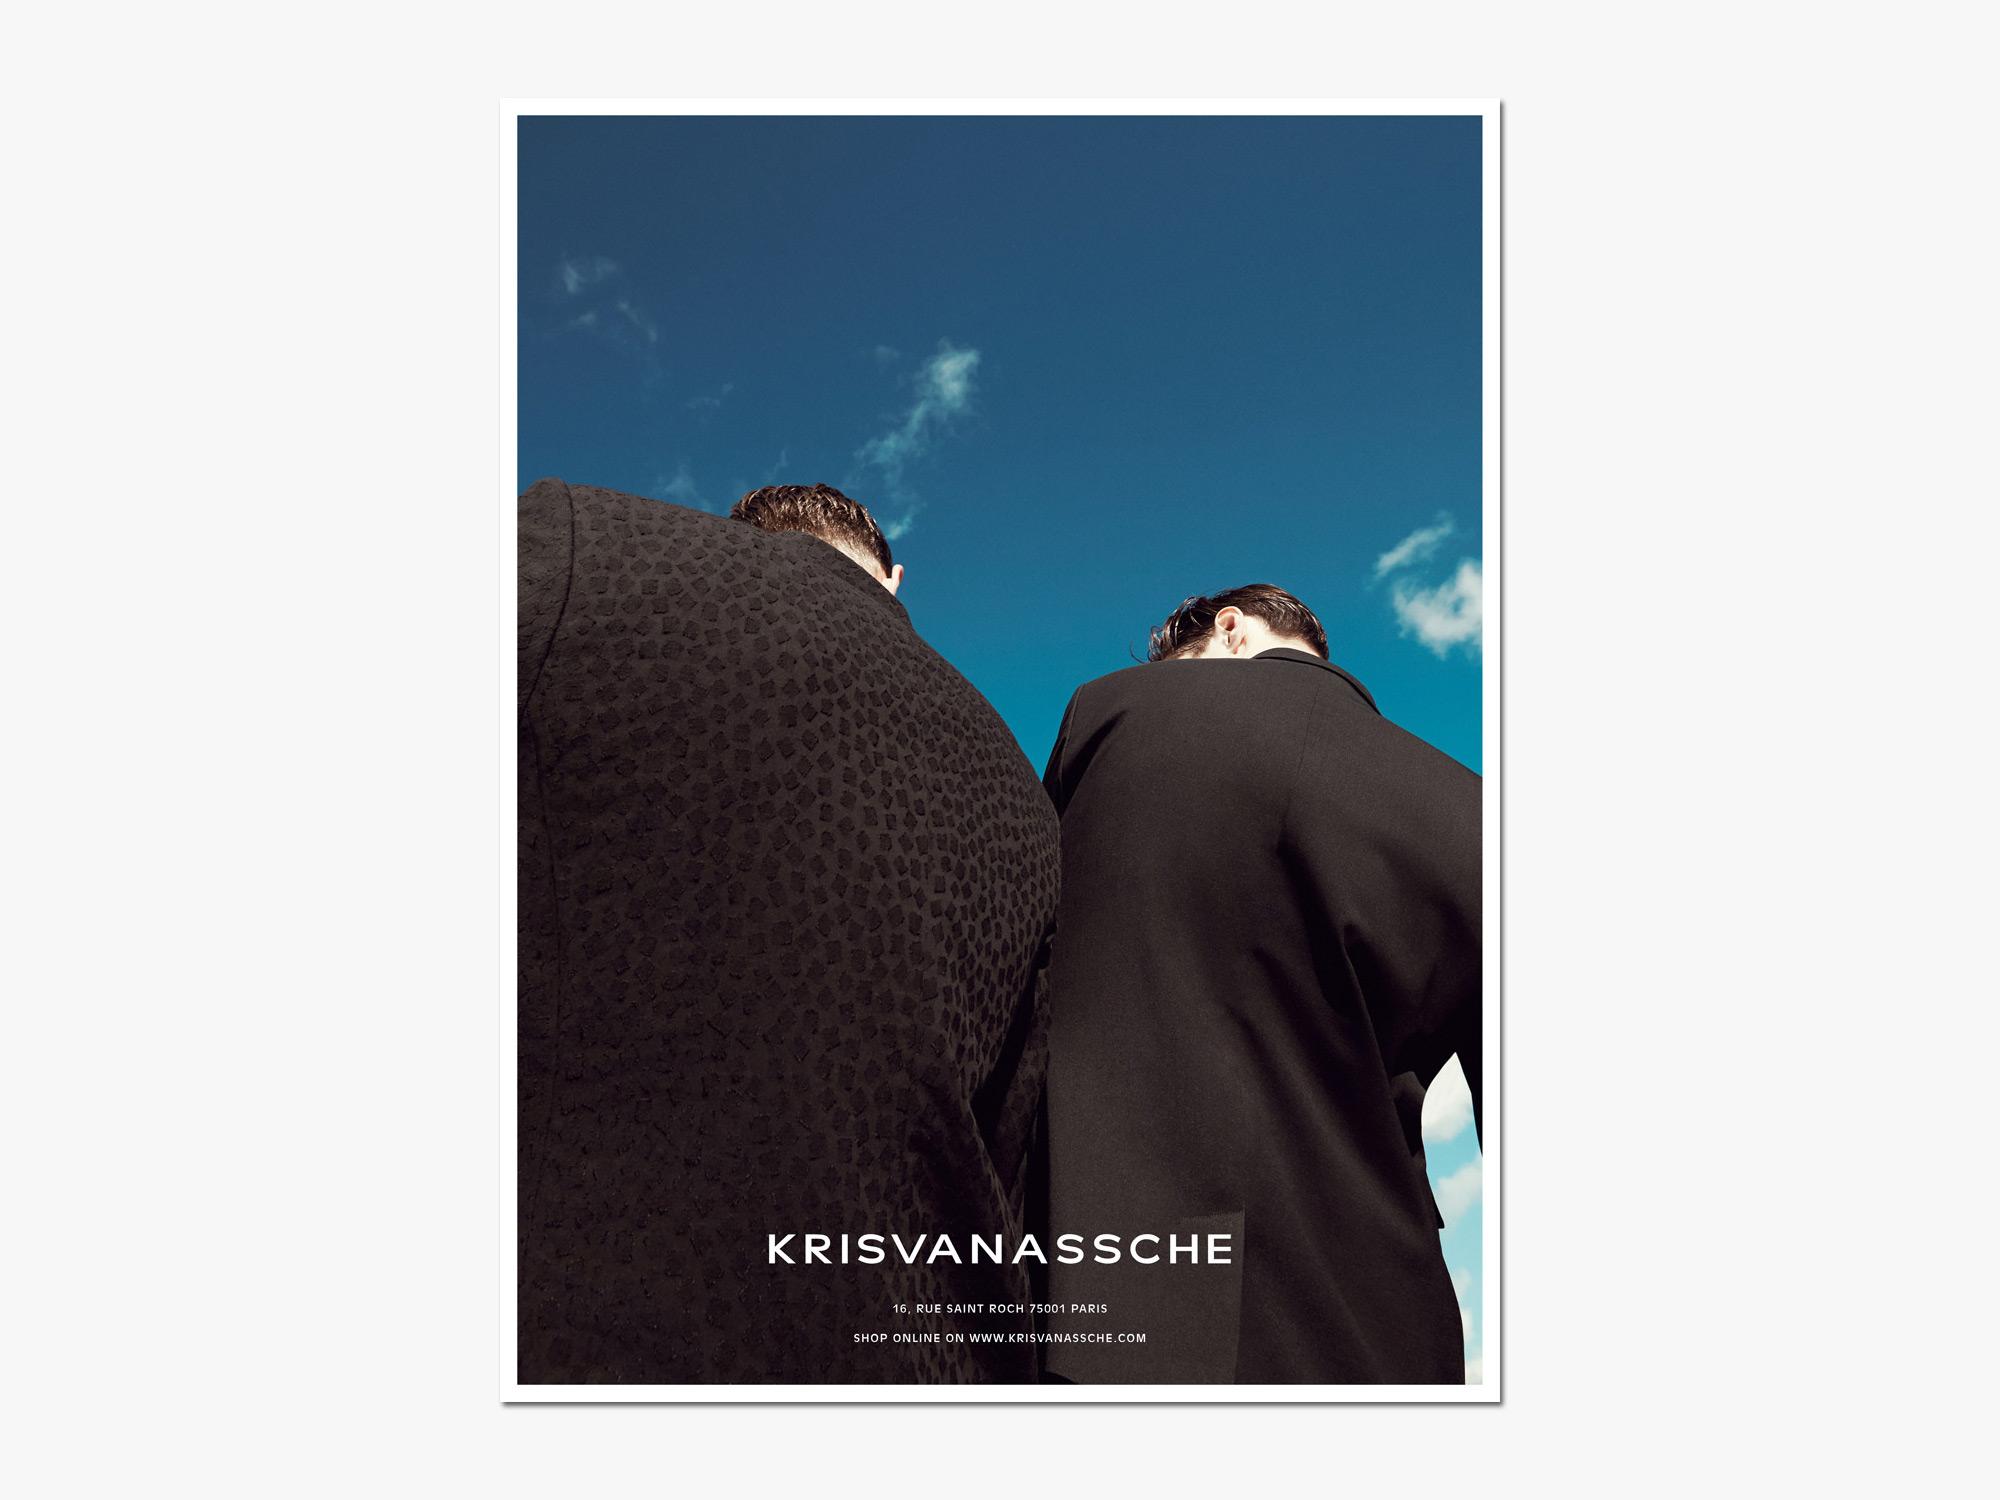 KRISVANASSCHE-SS14-Campaign-04